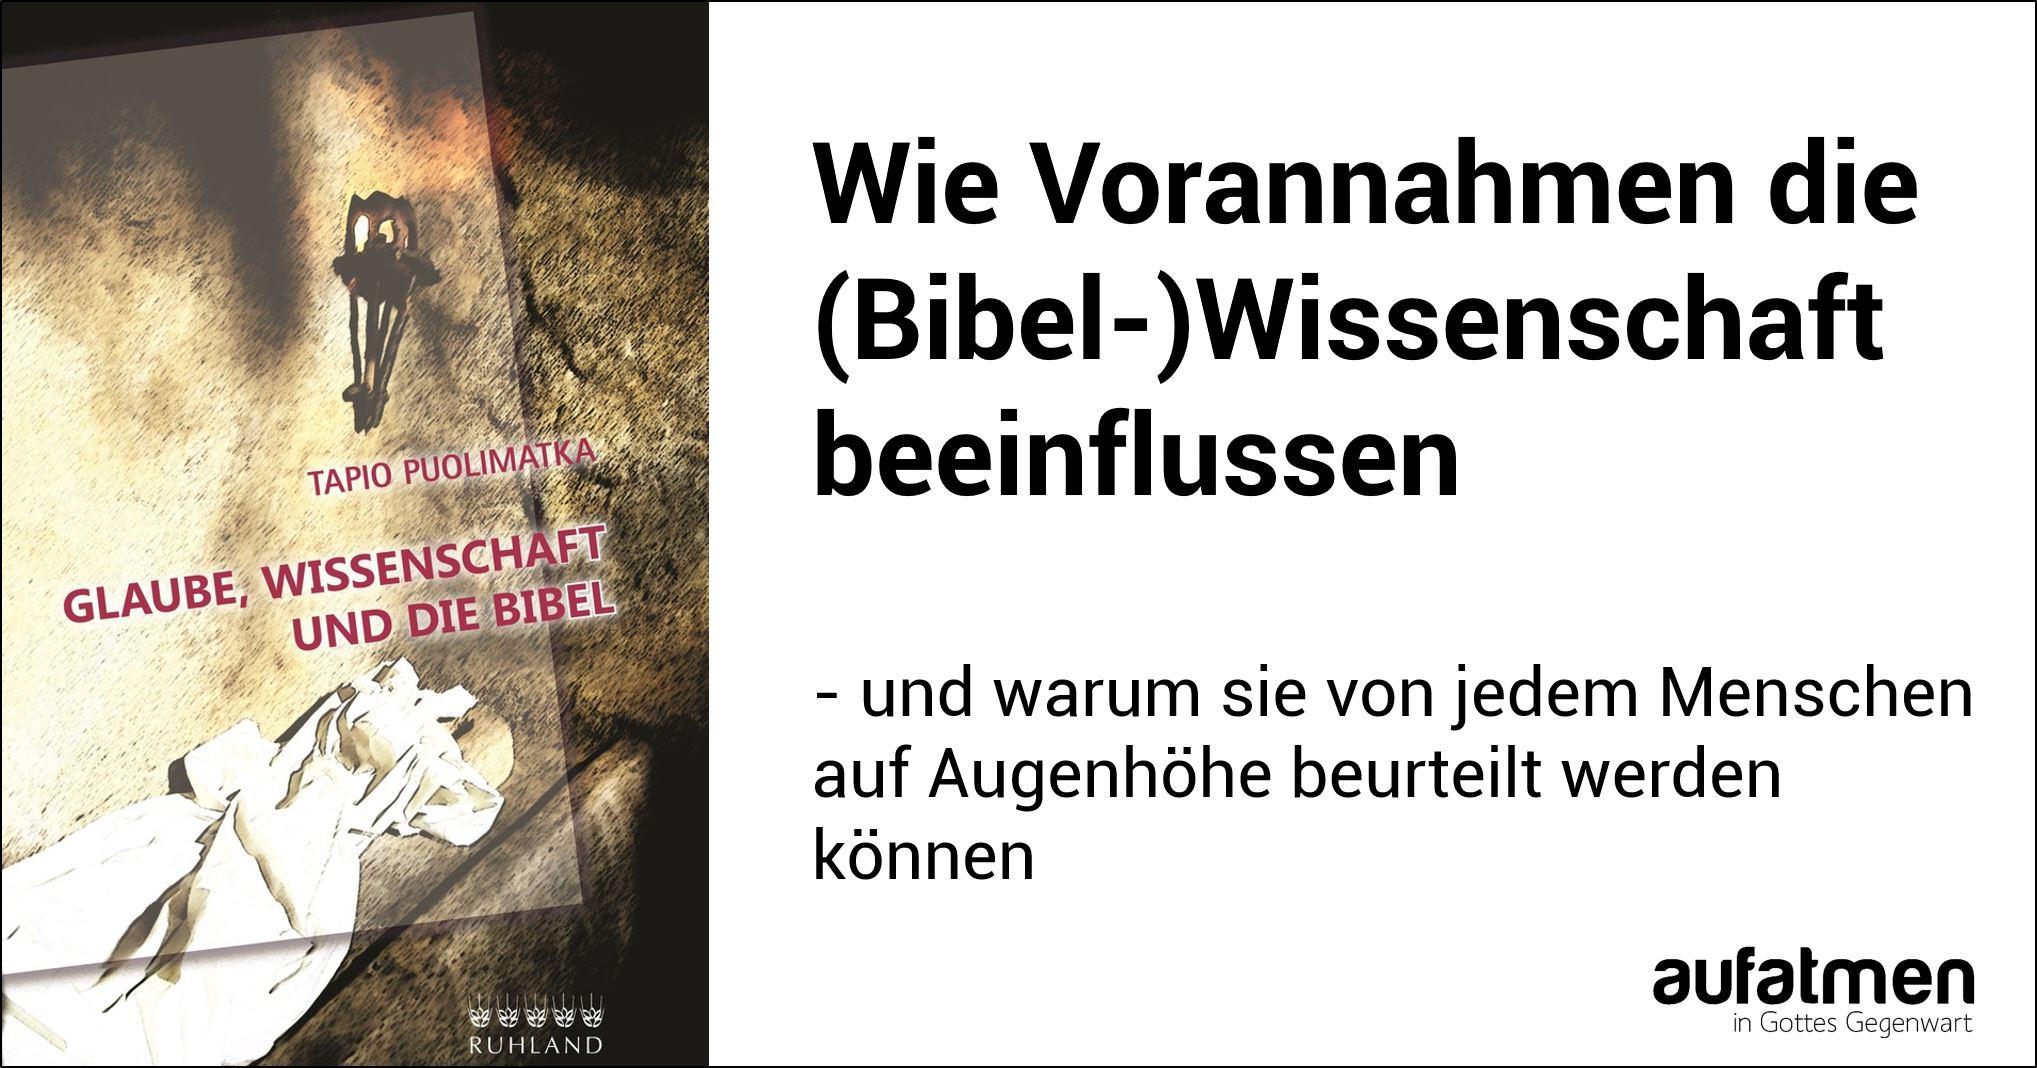 Wie Vorannahmen die (Bibel-)Wissenschaft beeinflussen